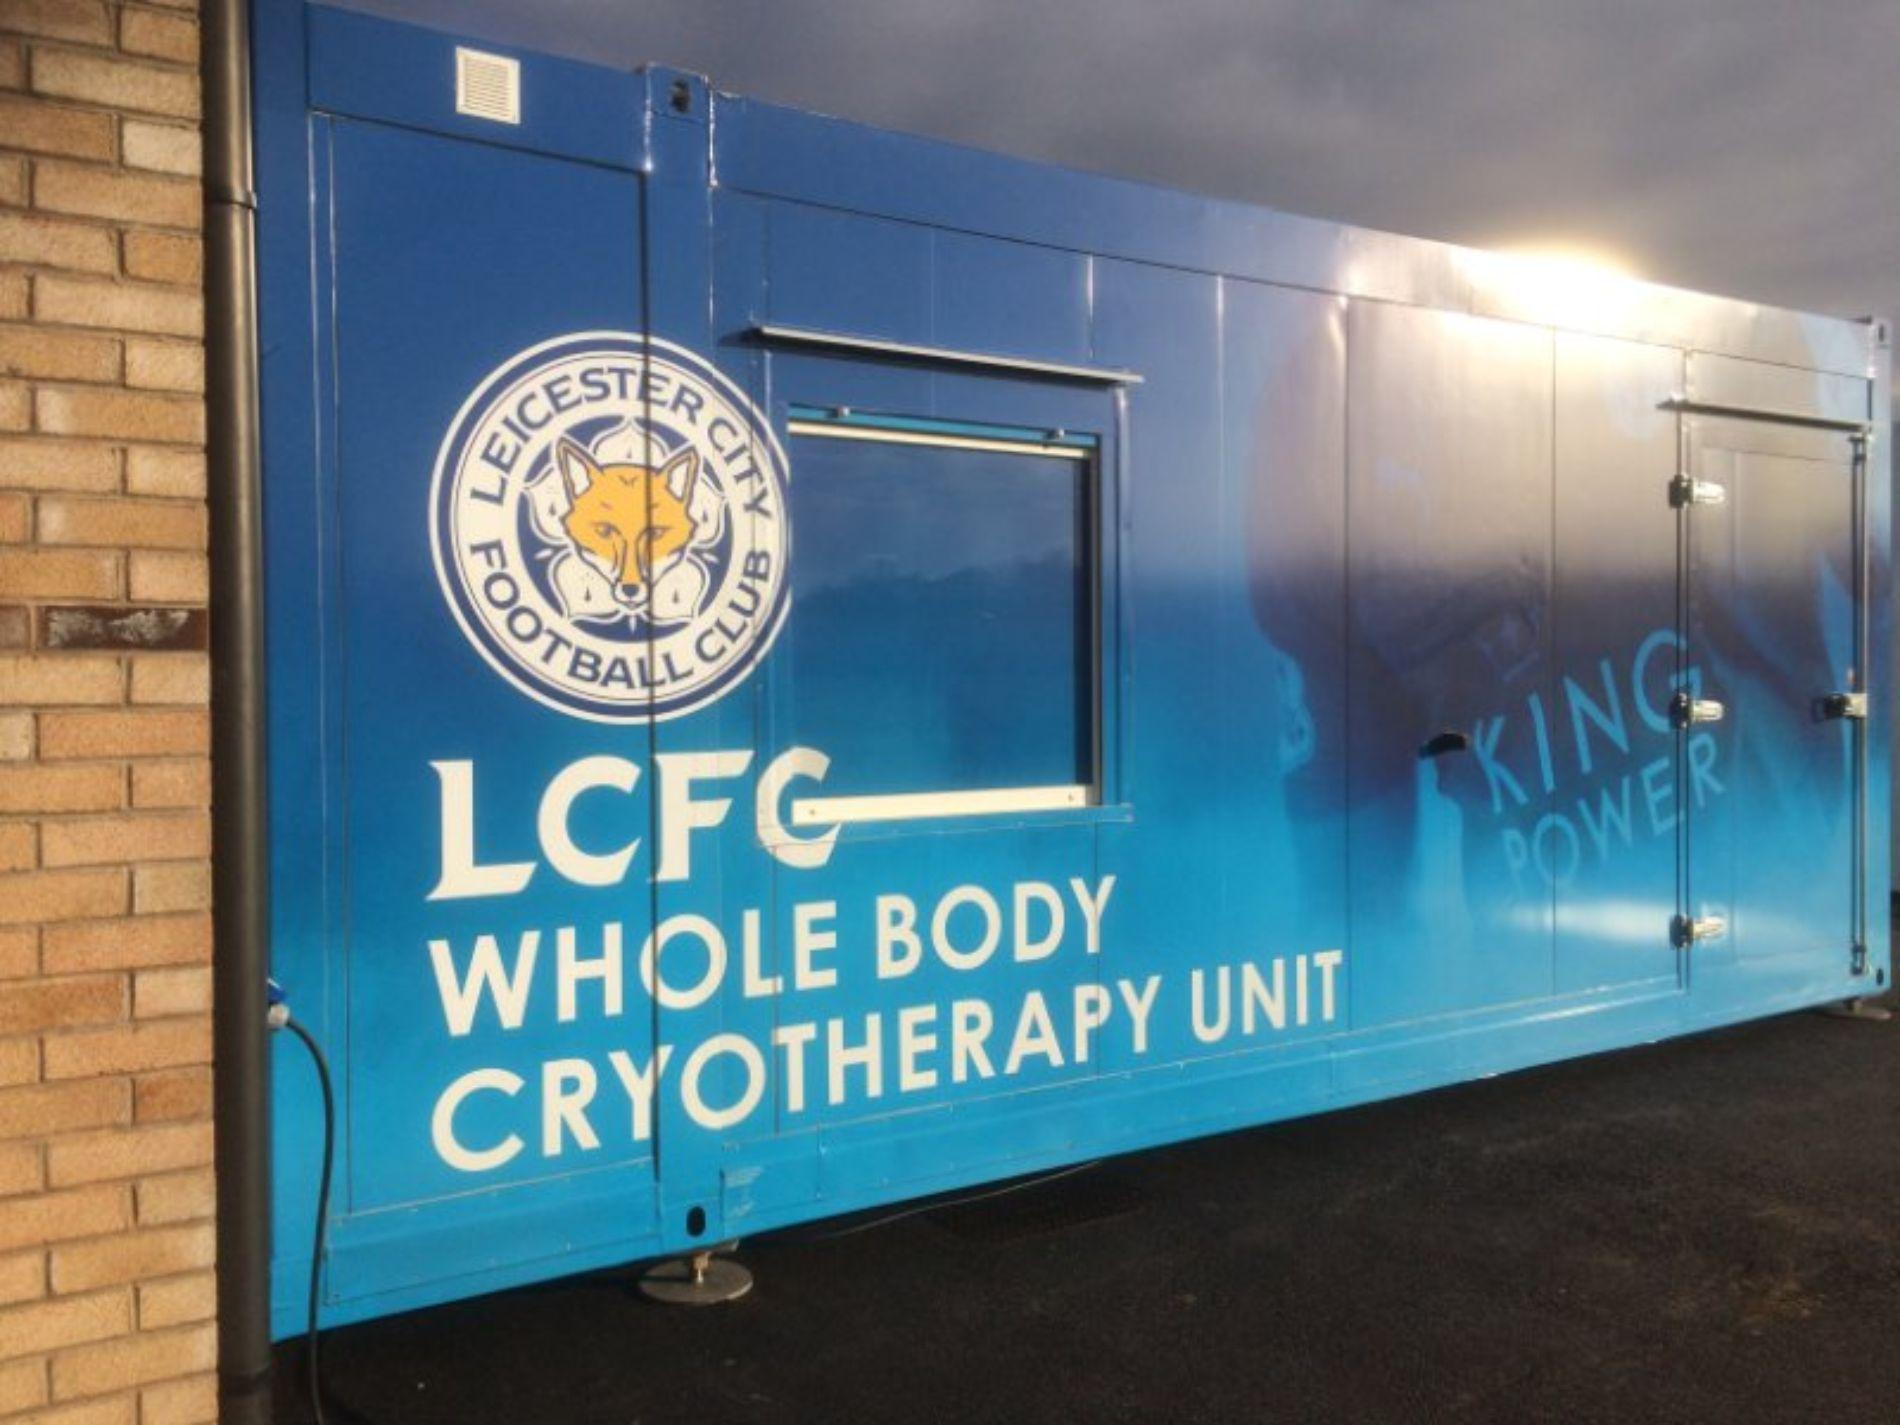 LFC whole body cryotherapy unit